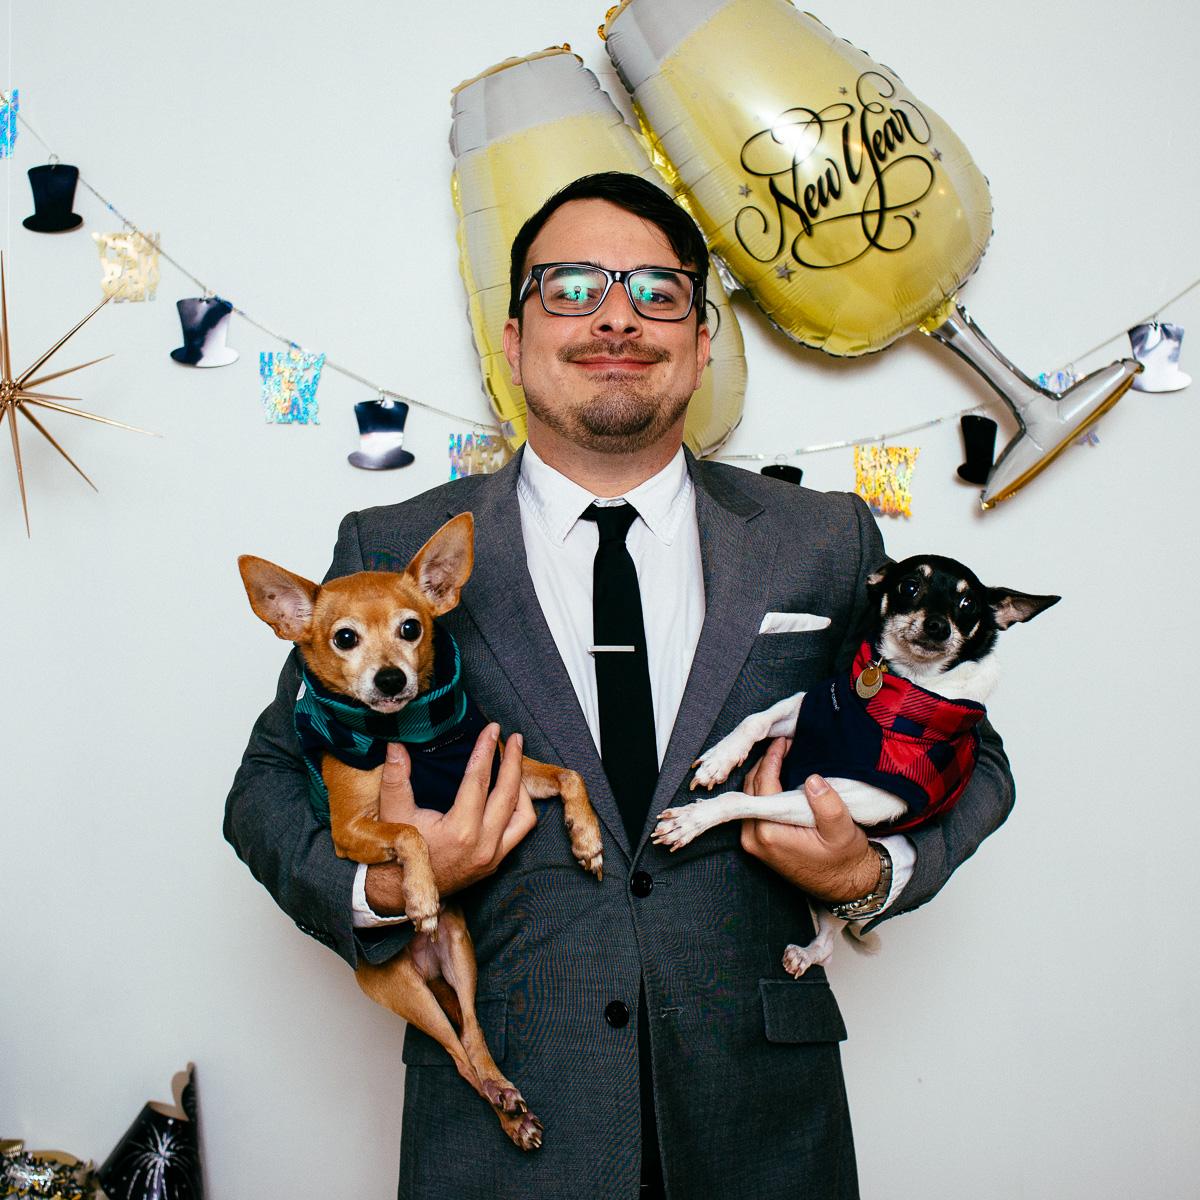 Mike-Ortiz_New-Years-2017-1.jpg